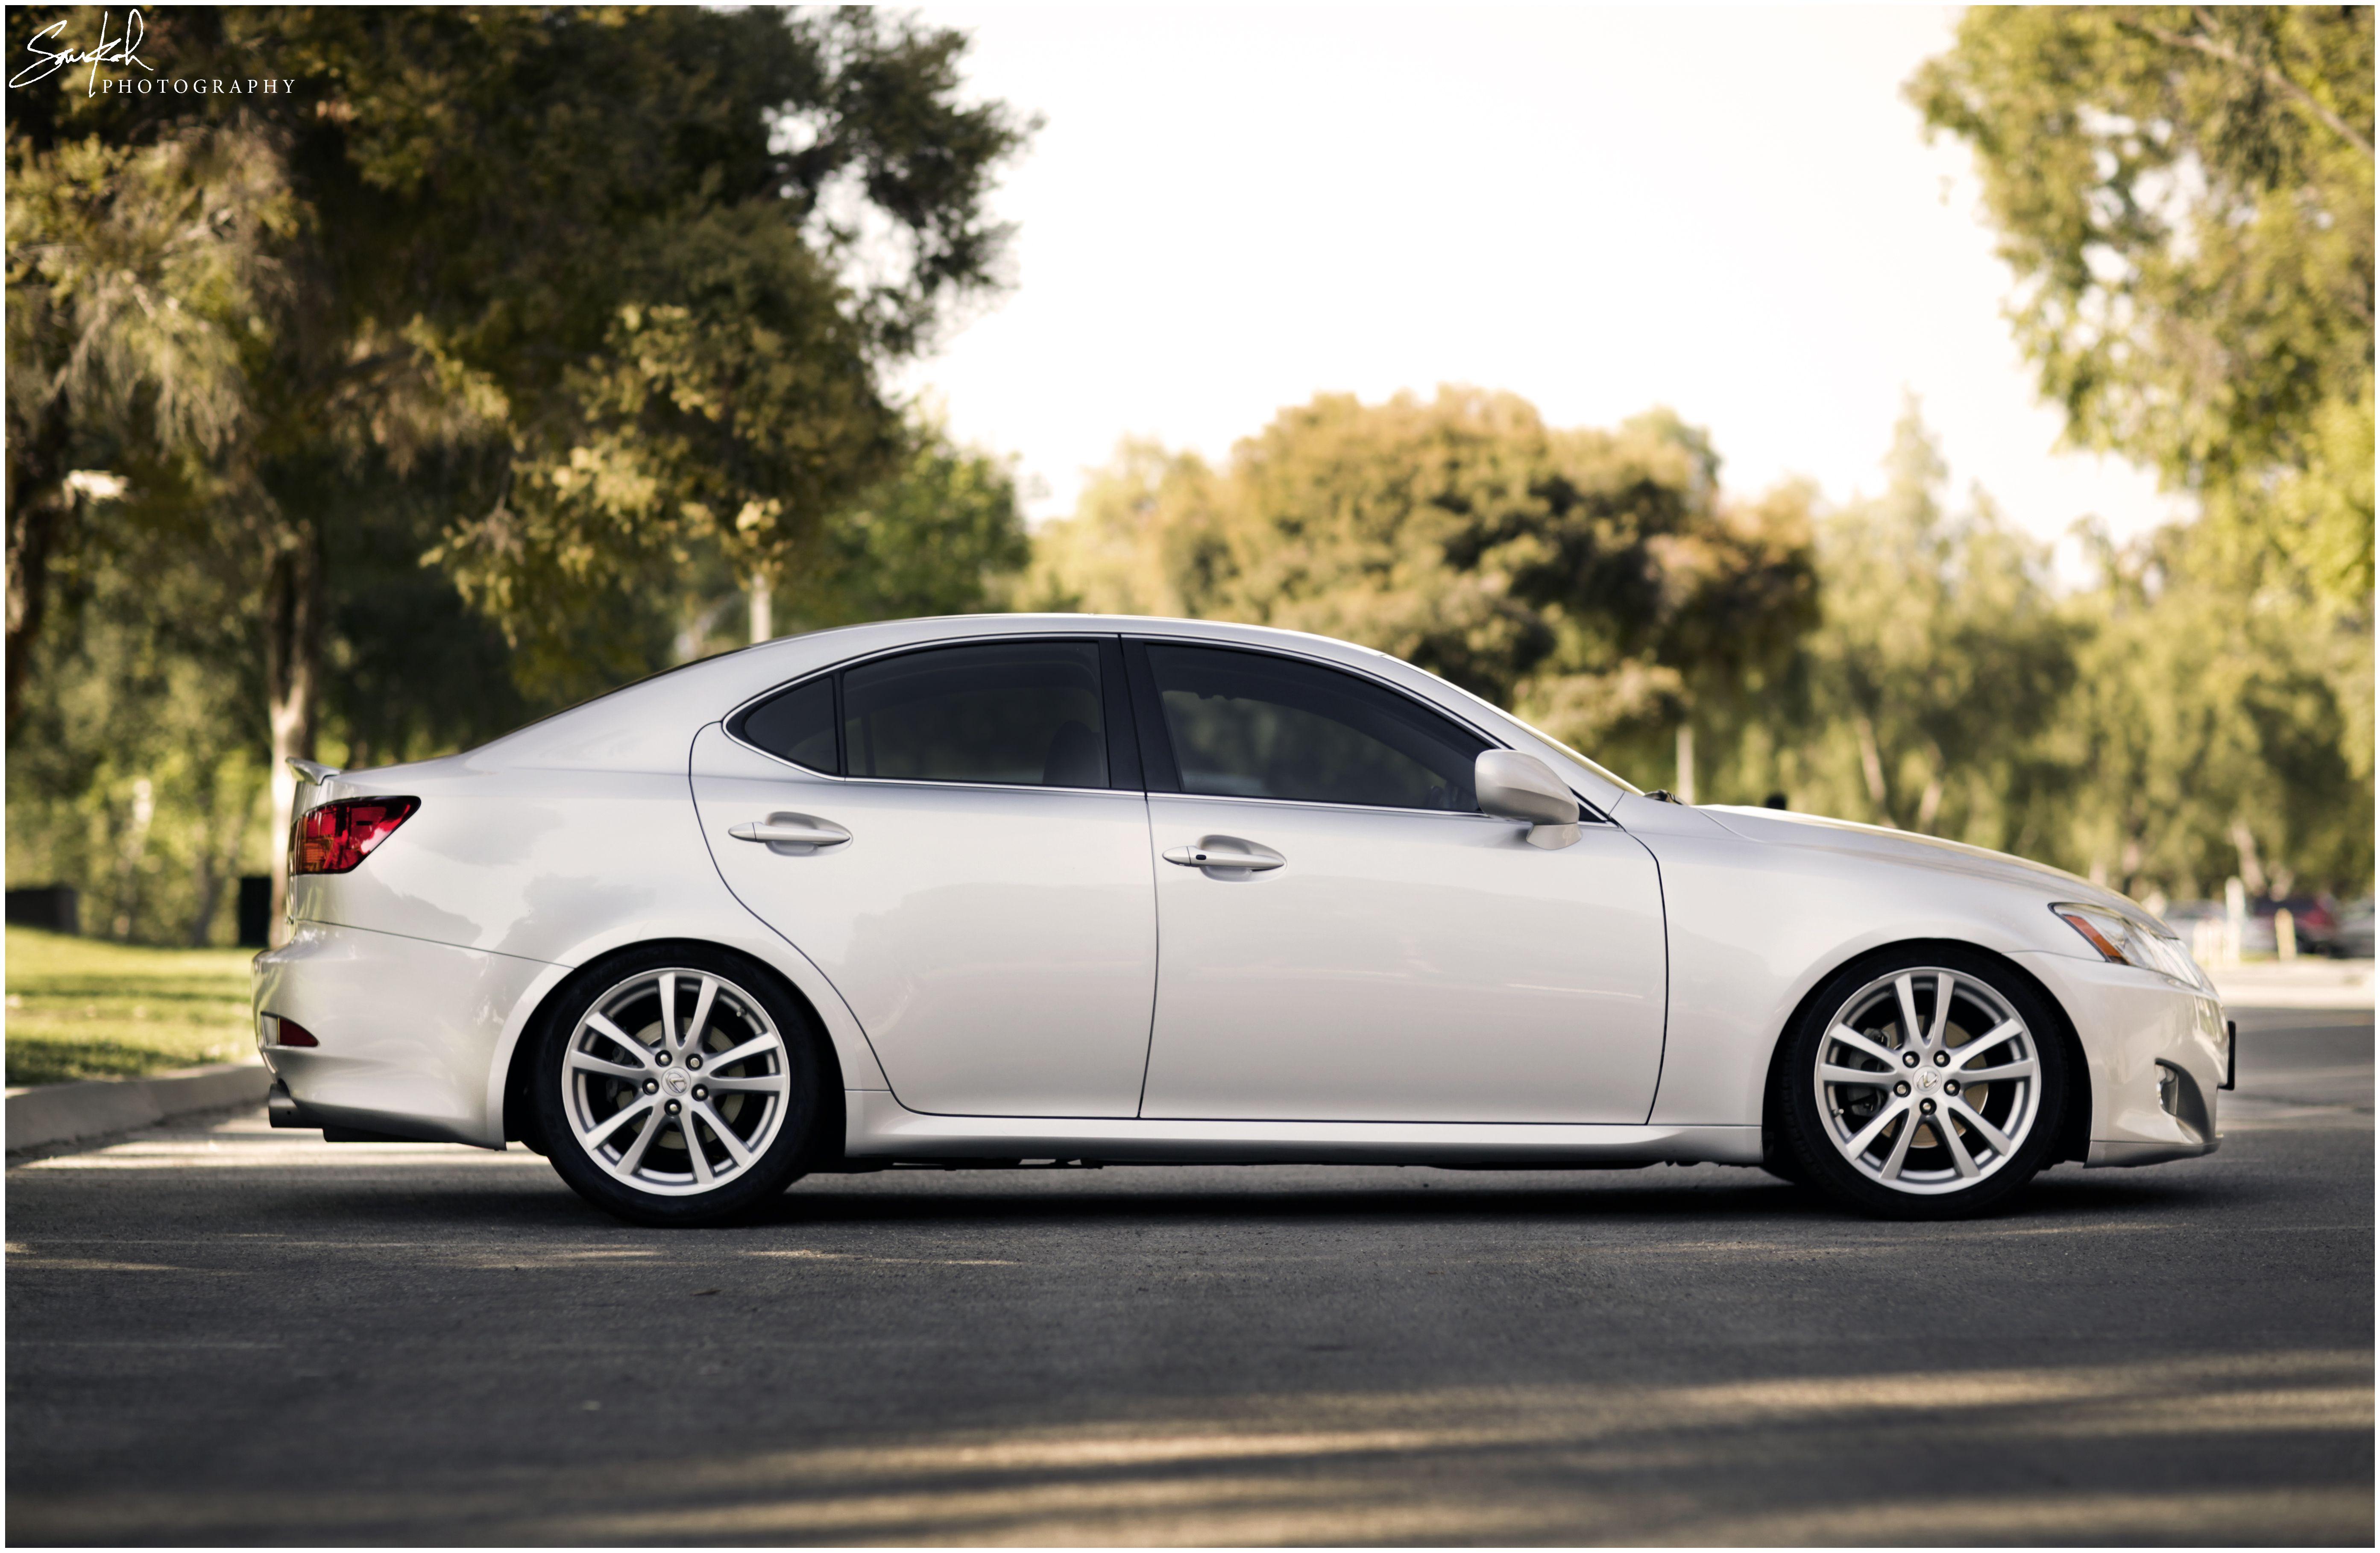 My Is Lexus Is250 Jdm Stance Lowered 85l Automotive Lexus